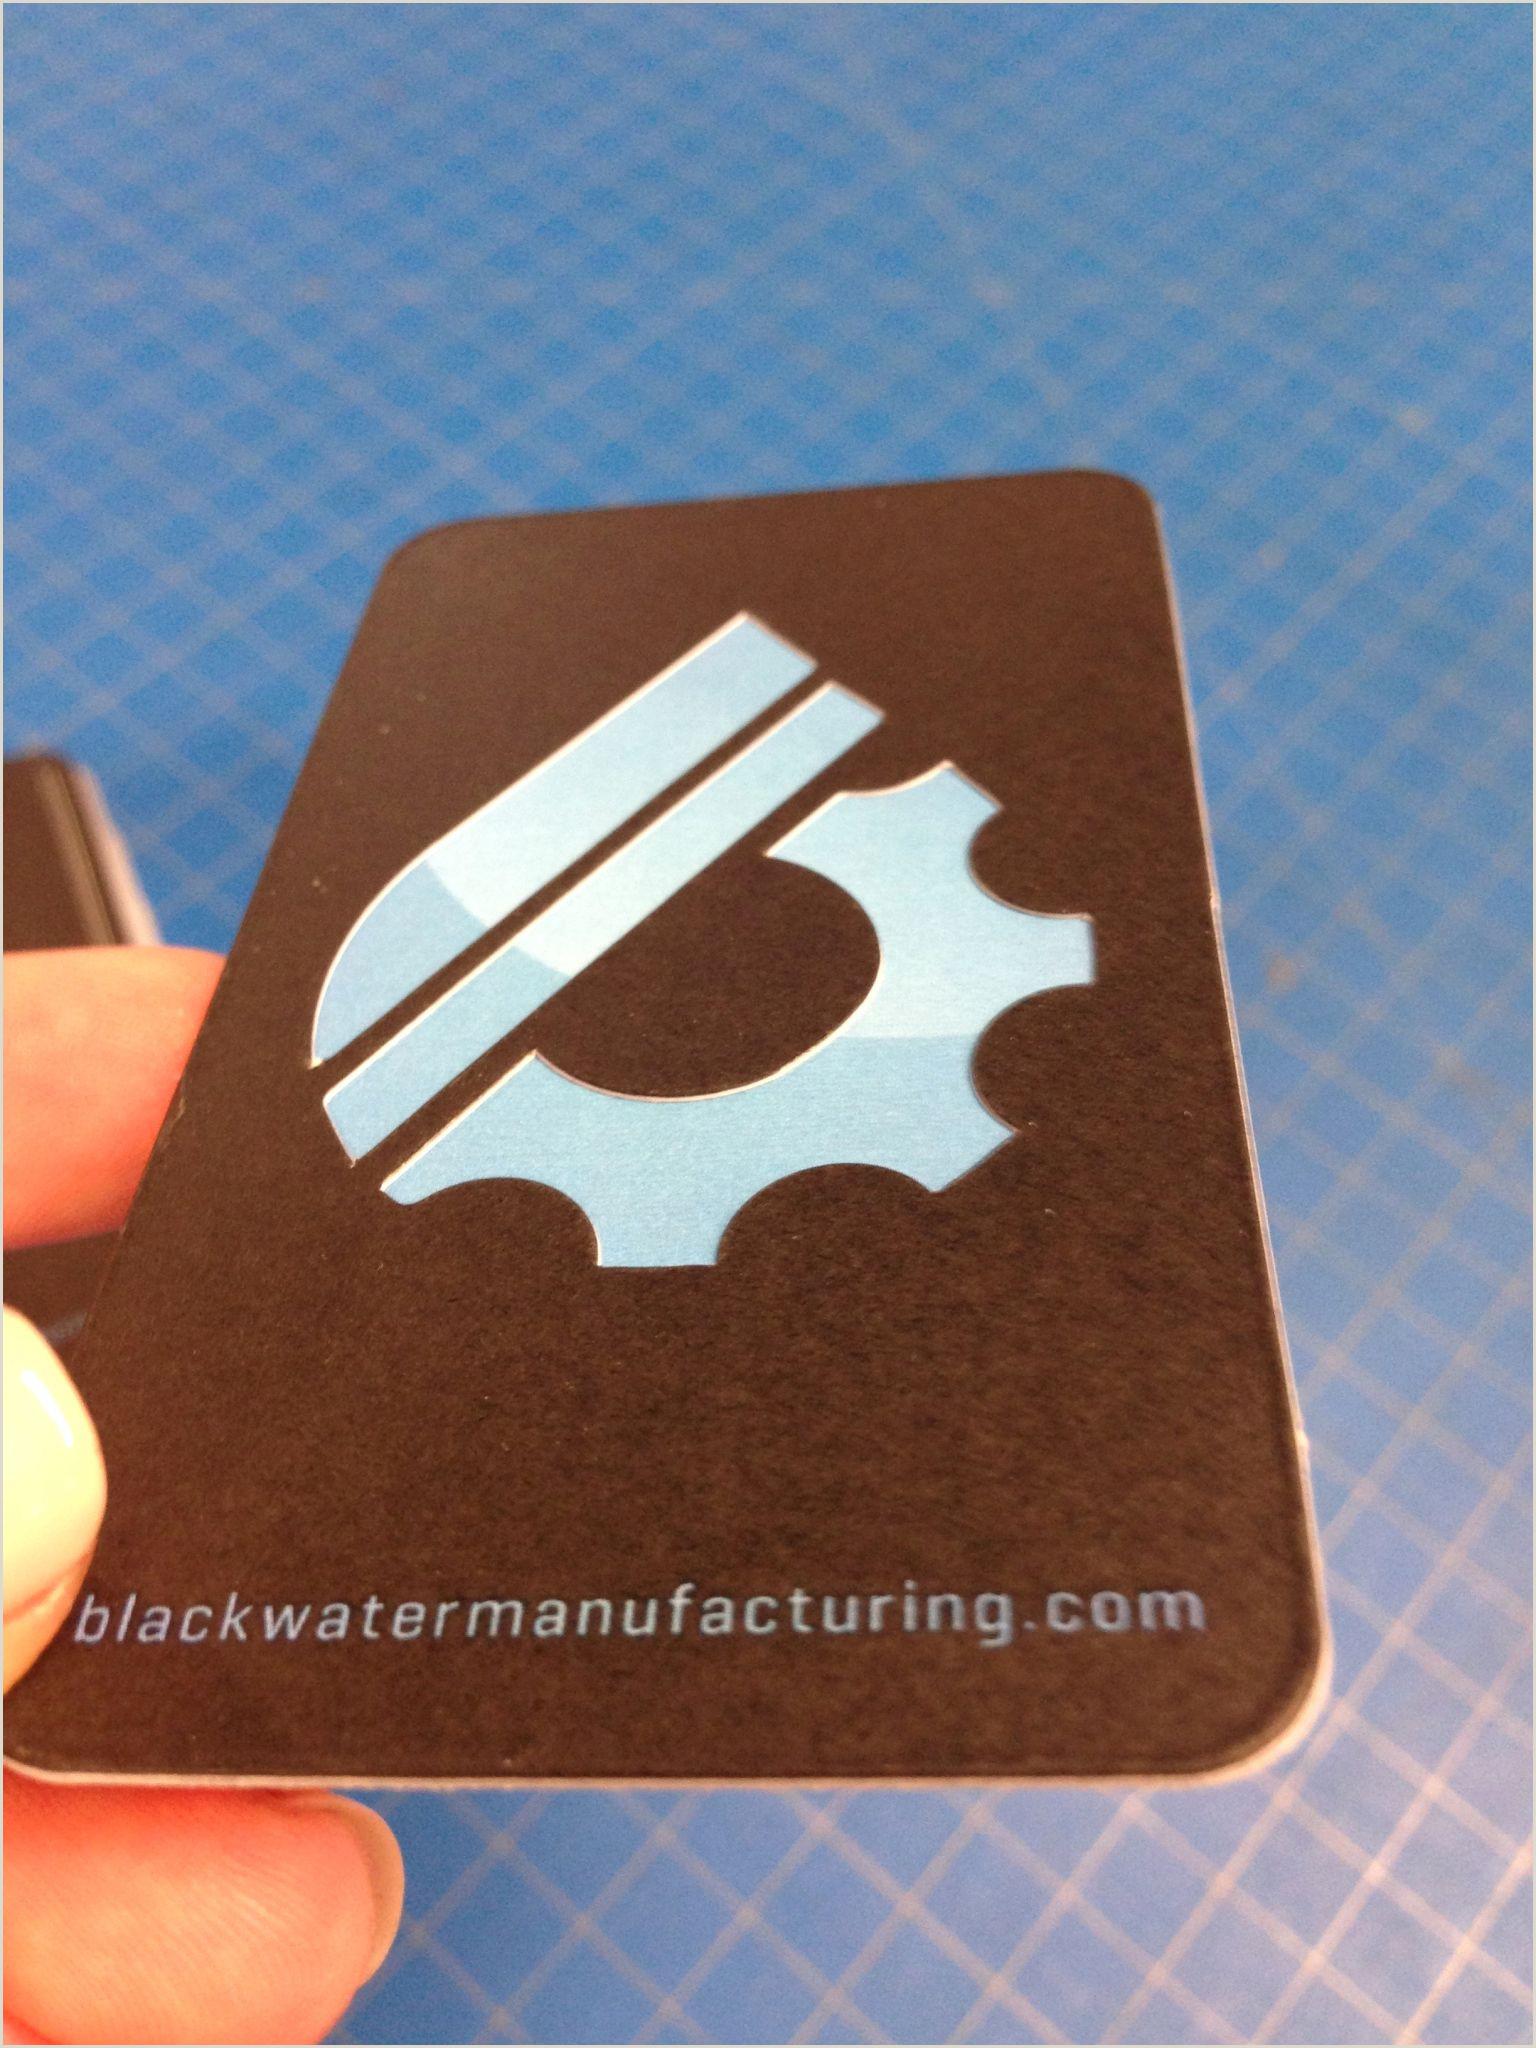 Web Design Business Cards Templates Eyelash Business Cards Templates